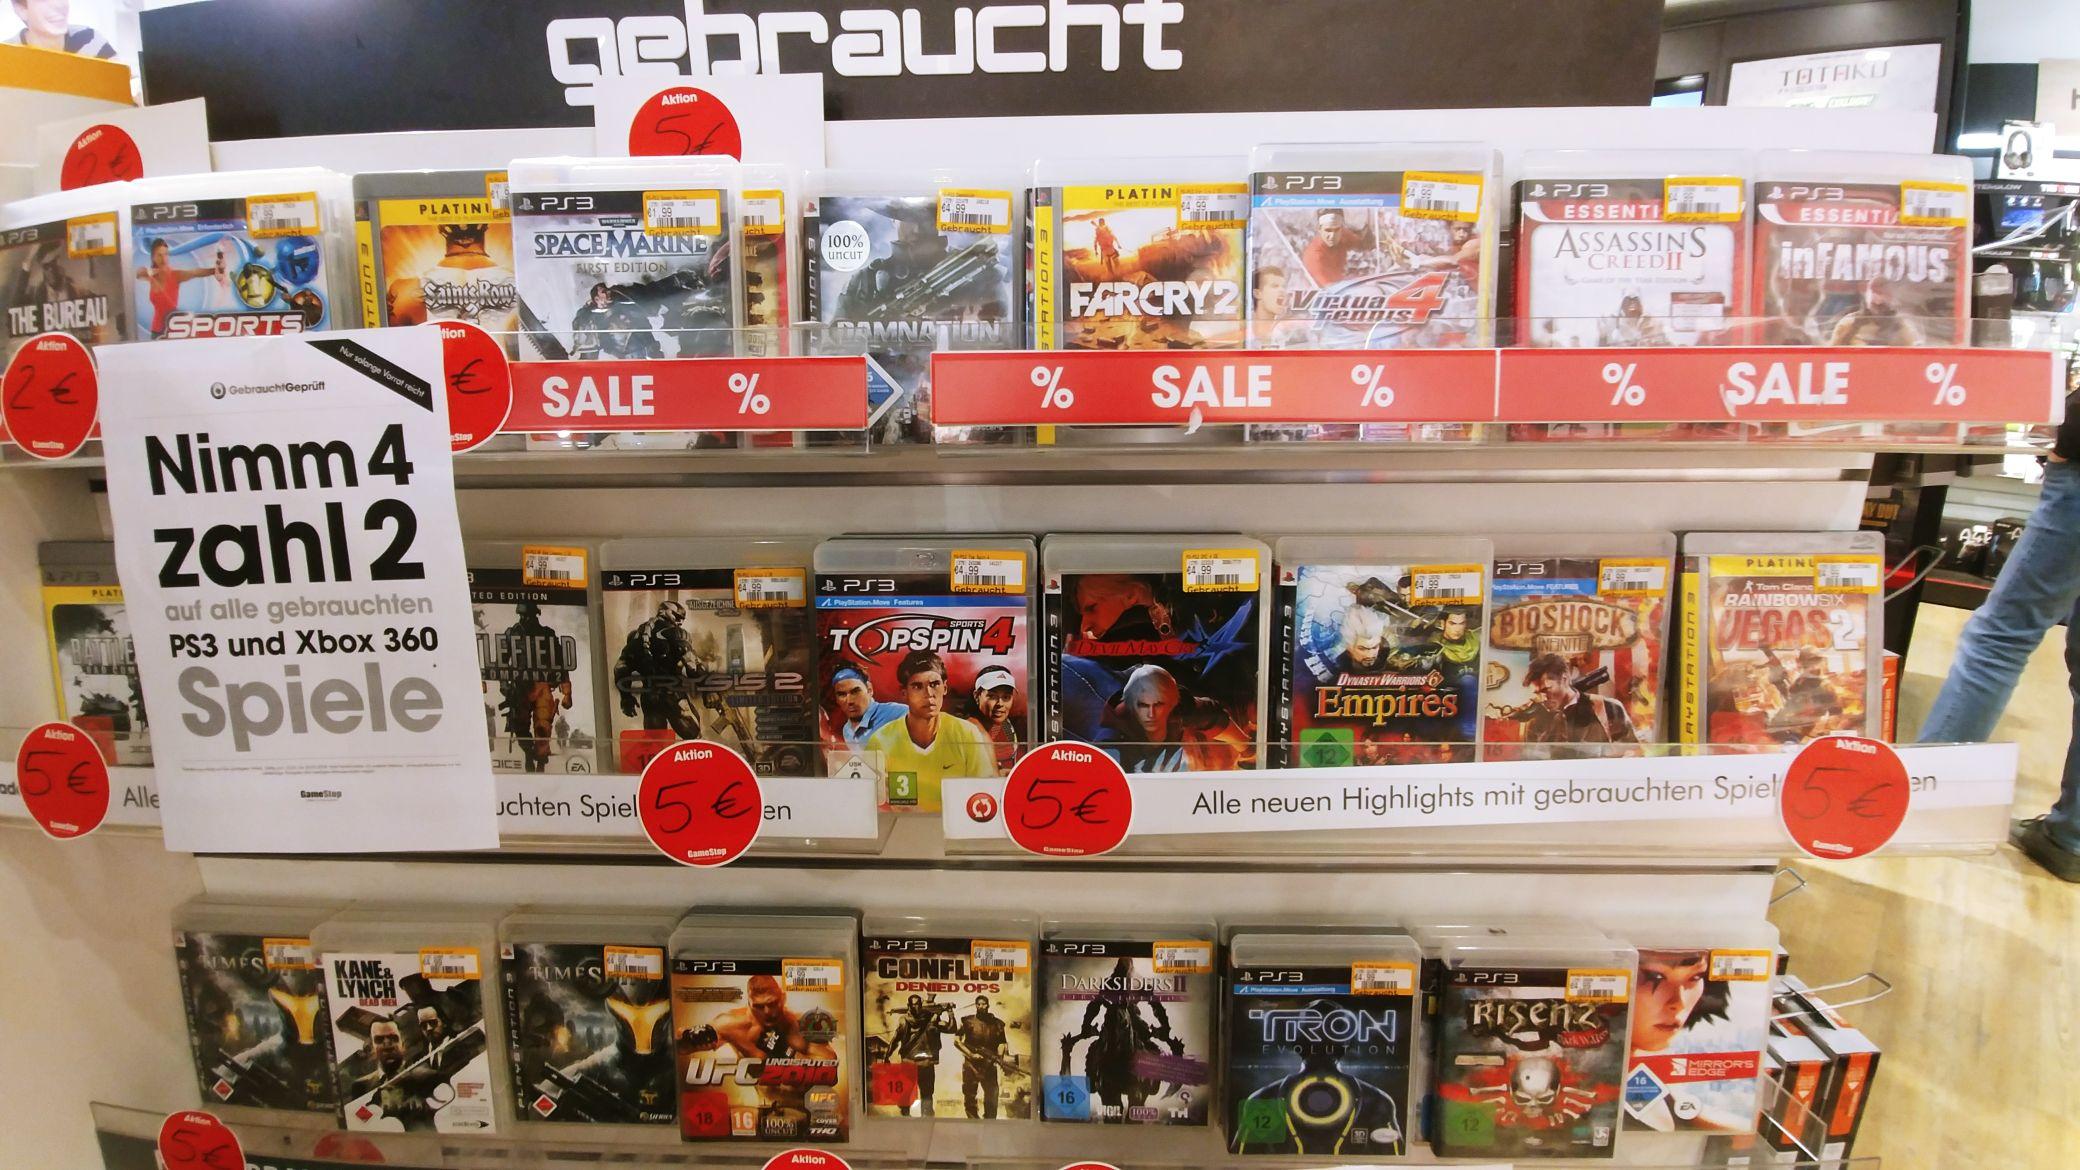 Playstation 3 (PS3) SPIELE ab 2,00€ -Game Stop RUHRPARK (LOKAL Bochum)